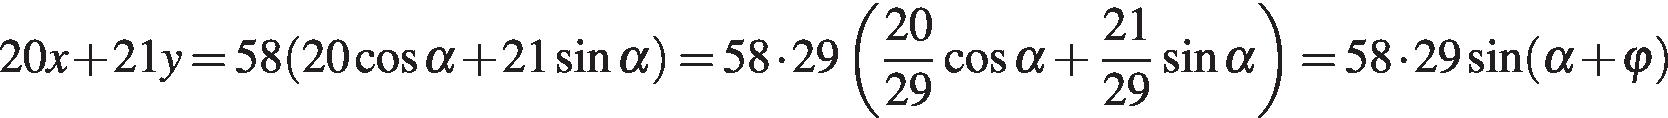 http://reshuege.ru/formula/0a/0a94729411e6272b4440b3cbbe7bad31p.png